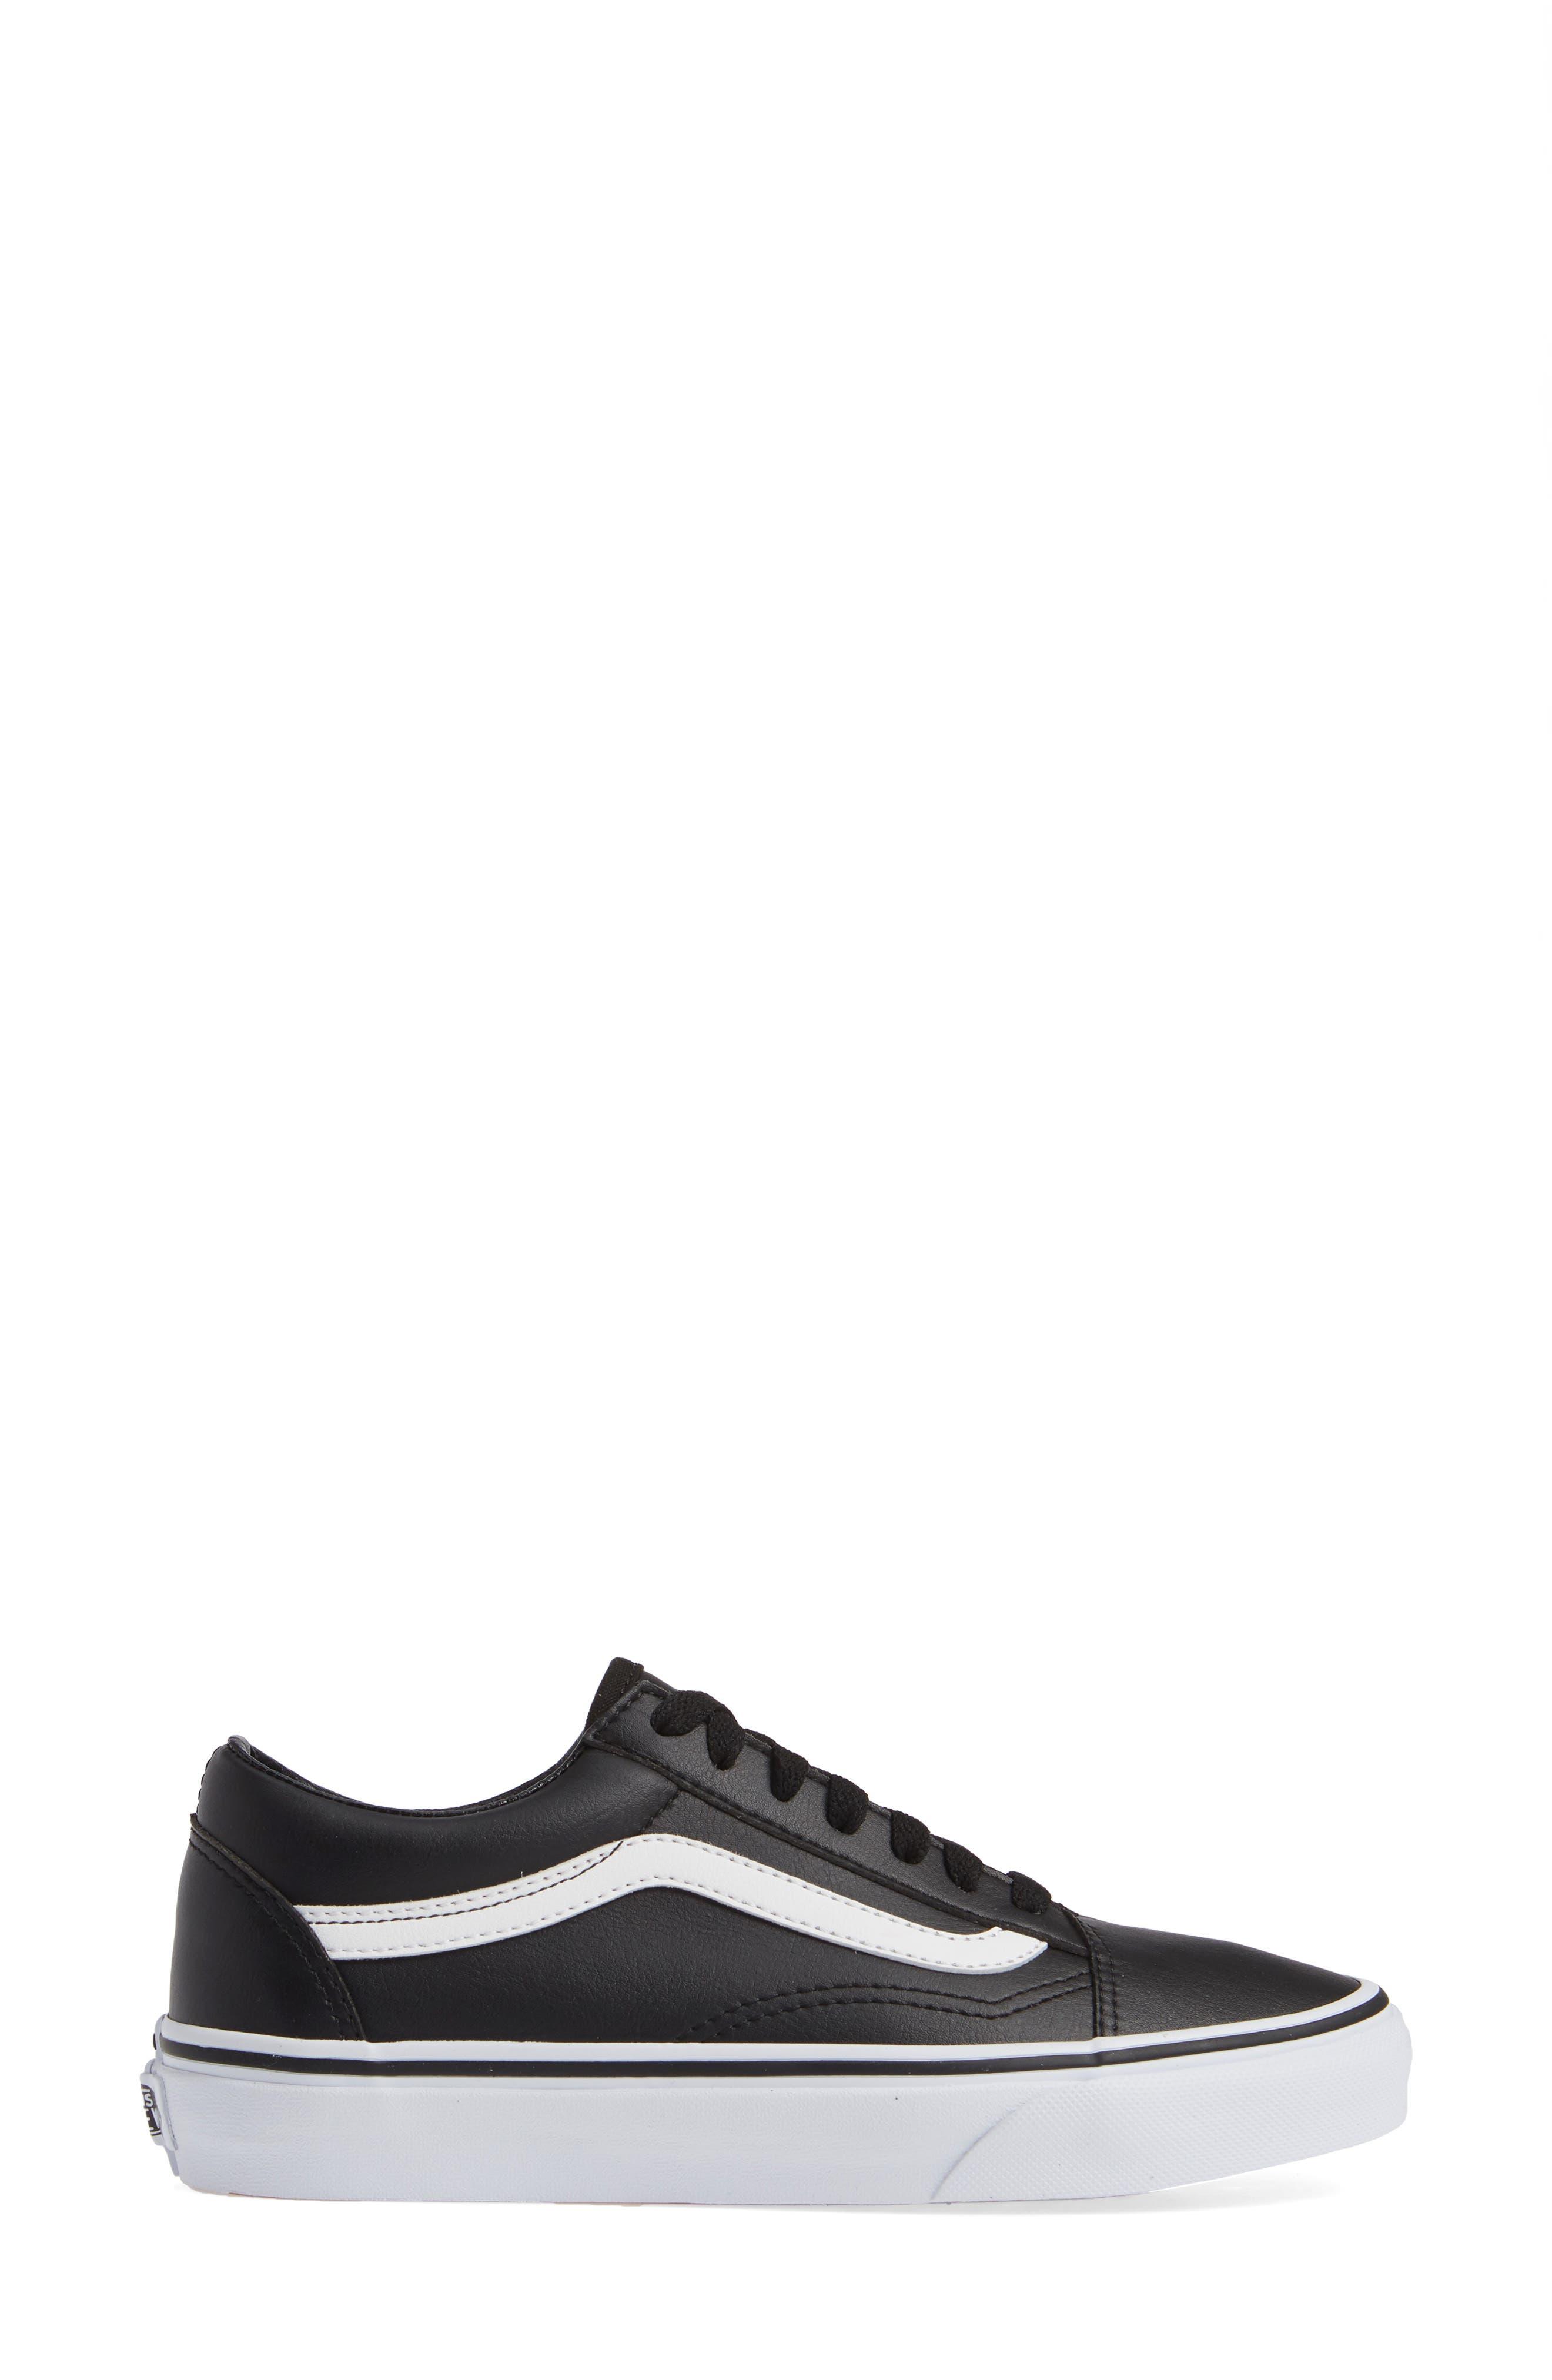 Old Skool Tumble Sneaker,                             Alternate thumbnail 3, color,                             BLACK/ TRUE WHITE